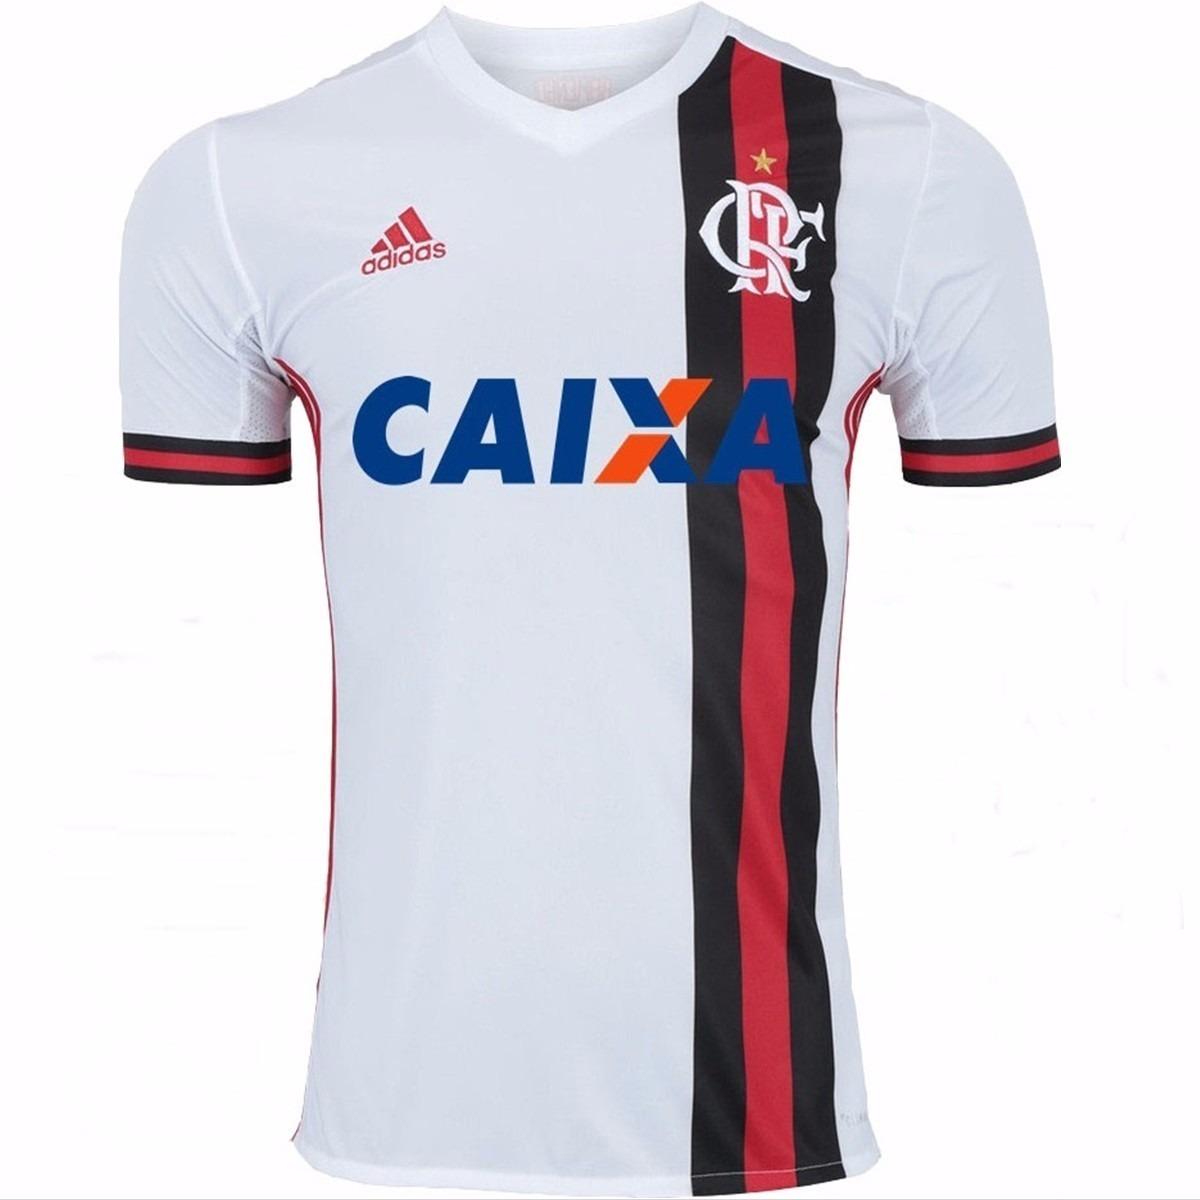 camisa time futebol flamengo adulto oficial adidas. Carregando zoom. 1b8ef5ae66346